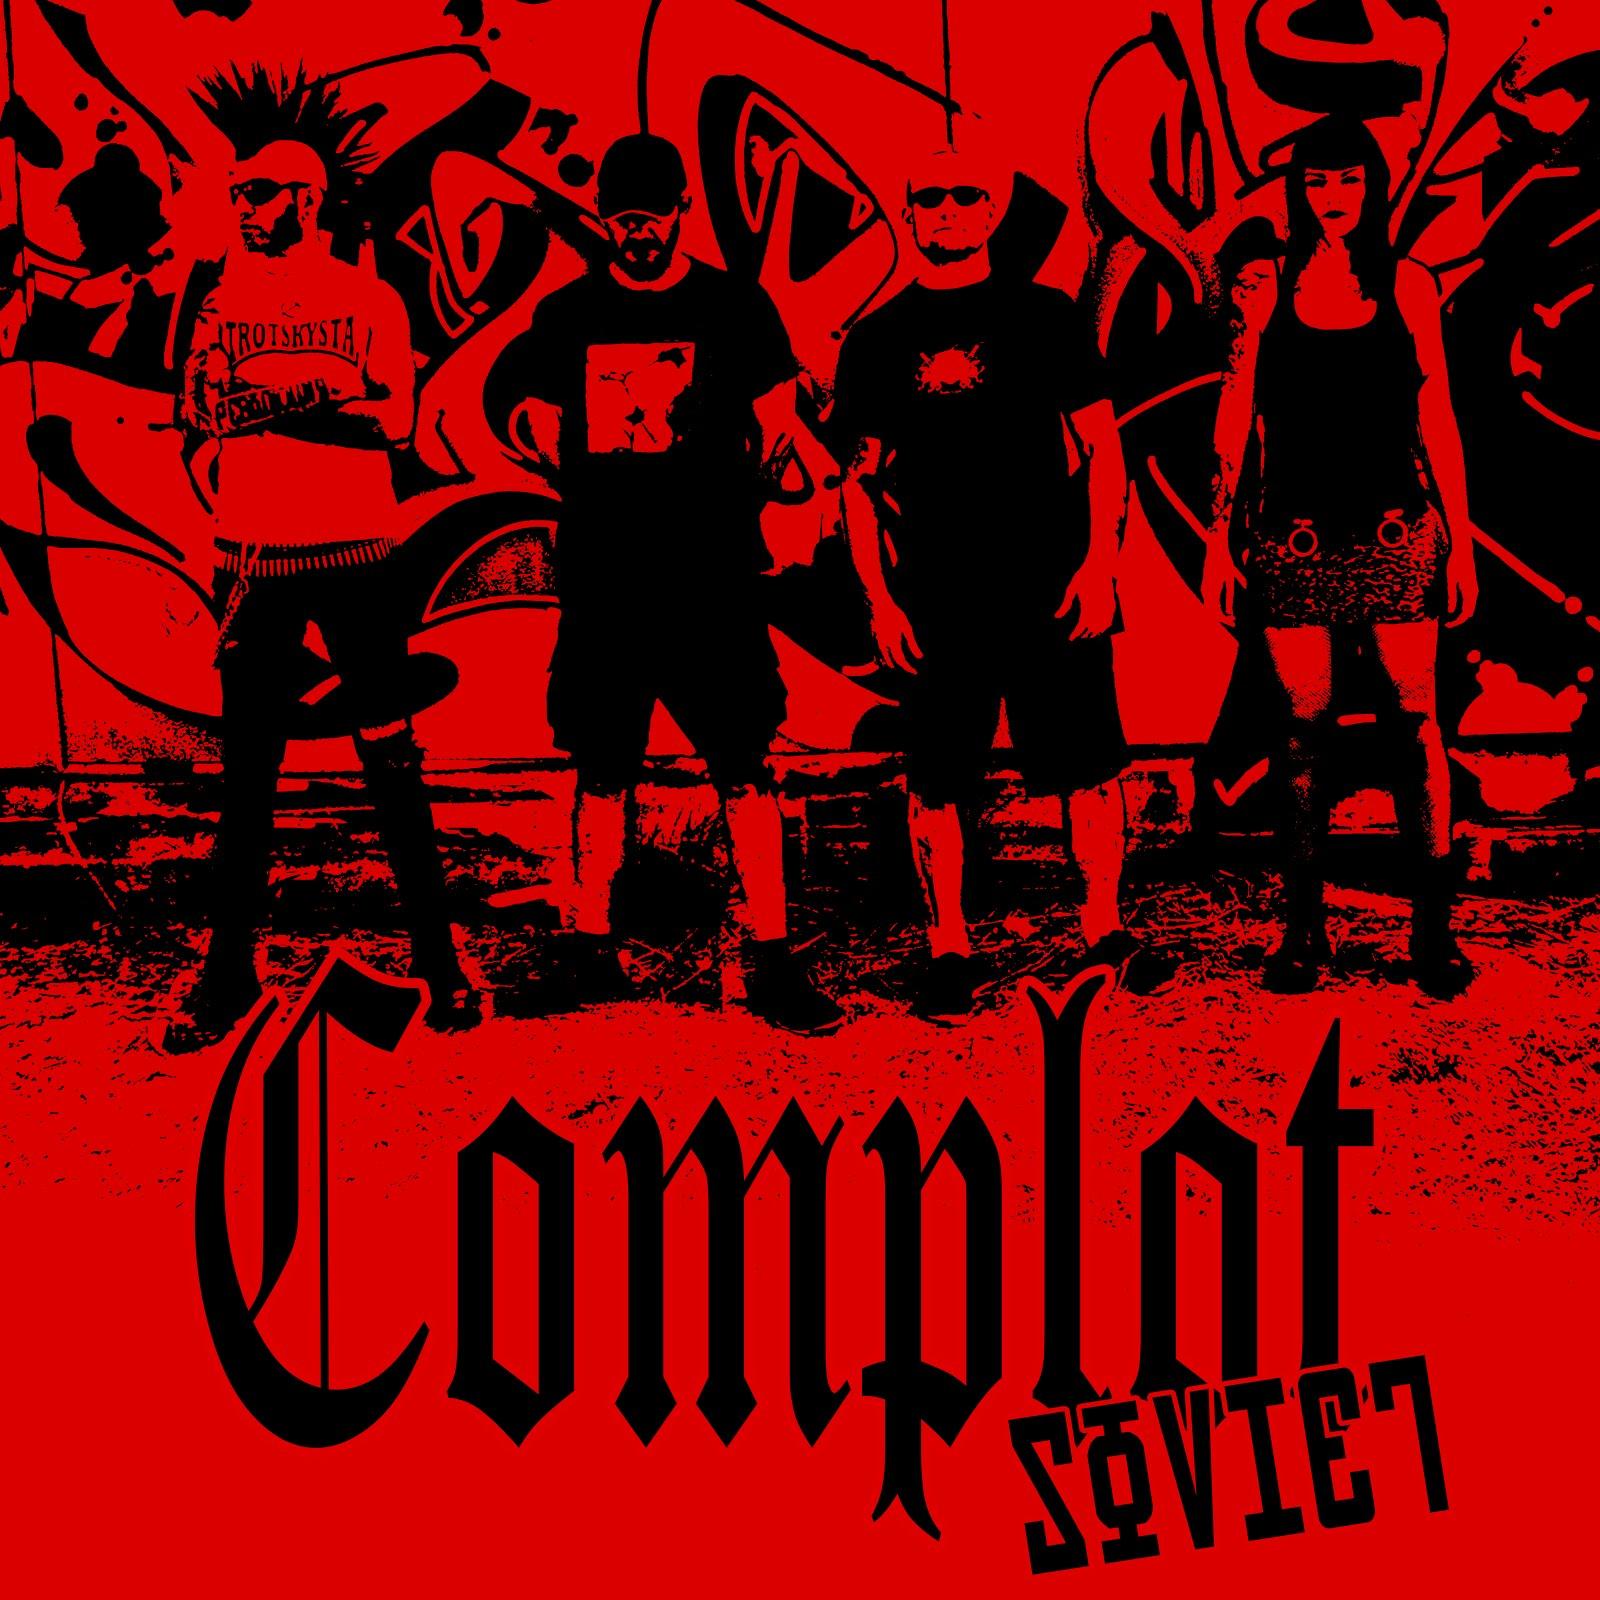 COMPLOT SOVIET